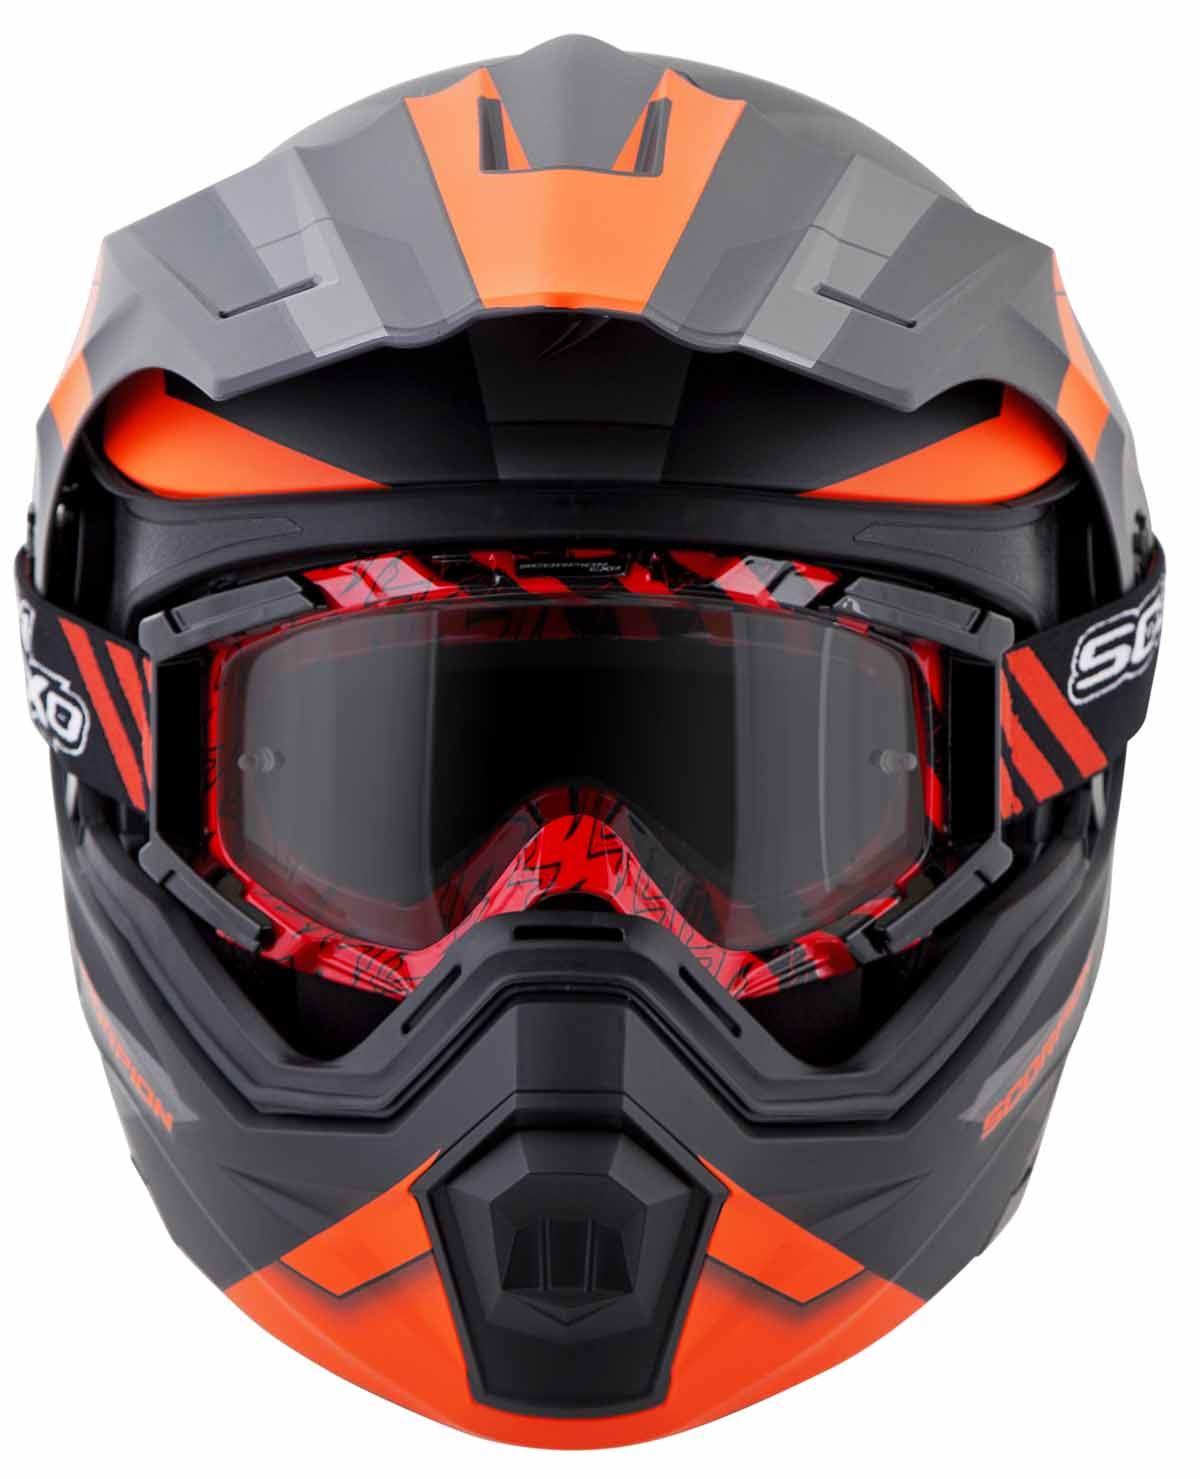 Scorpion-EXO-AT950-Helmet-Flip-Up-Modular-Dual-Sport-Adventure-ADV-DOT-XS-3XL miniature 48